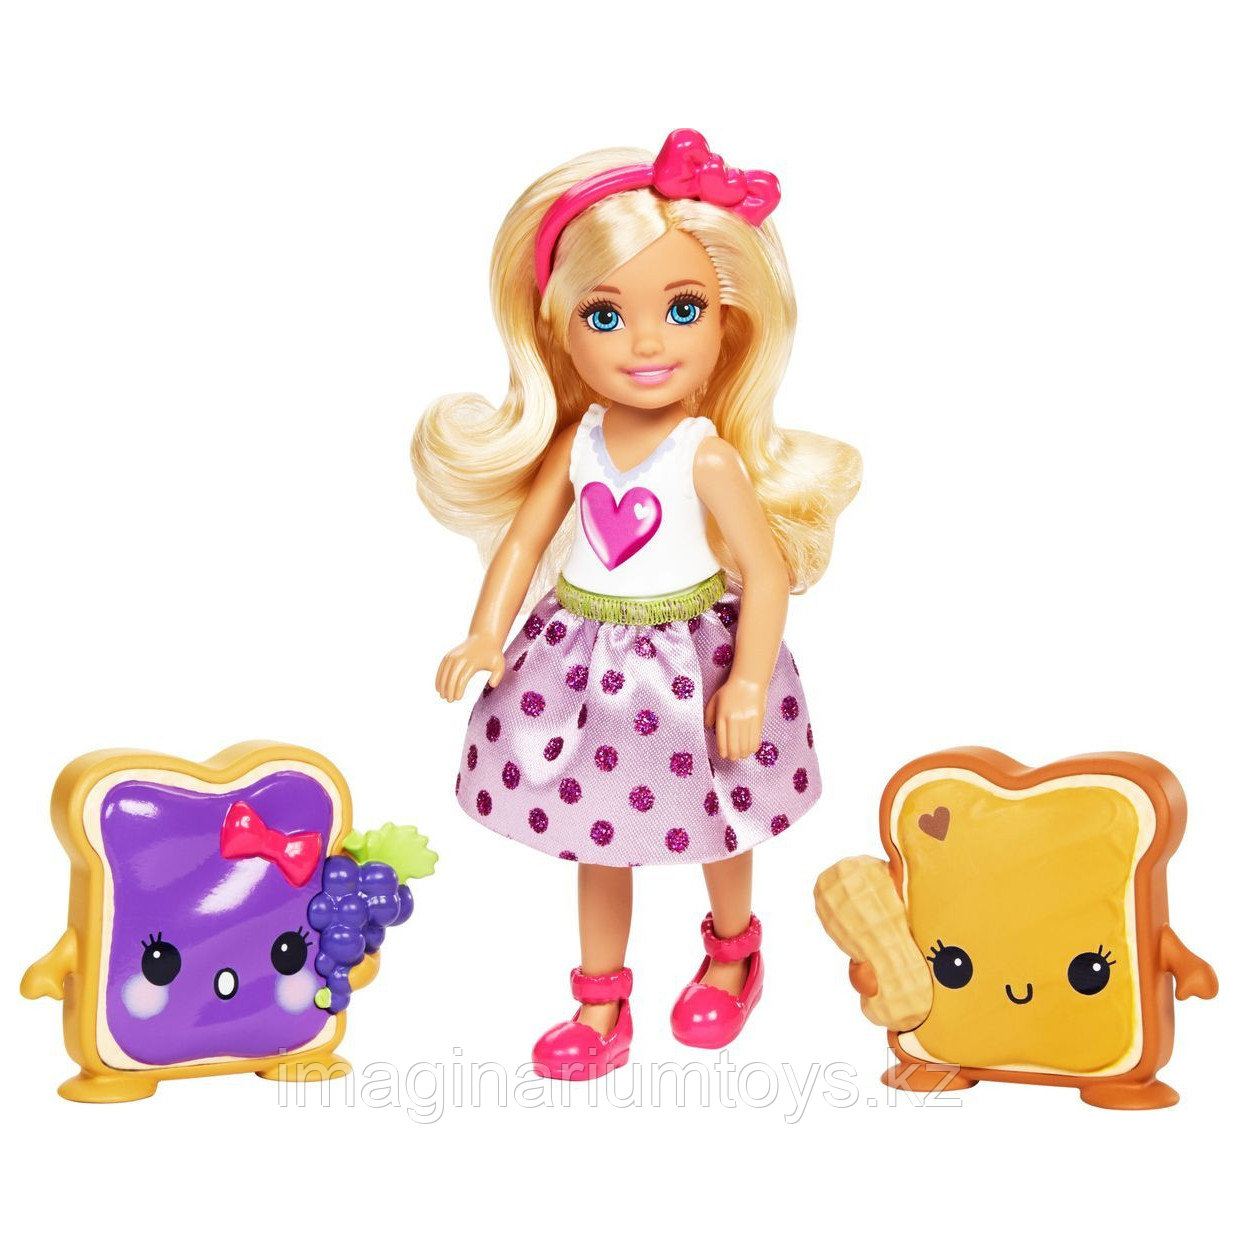 Mattel Barbie Барби Челси и сладости